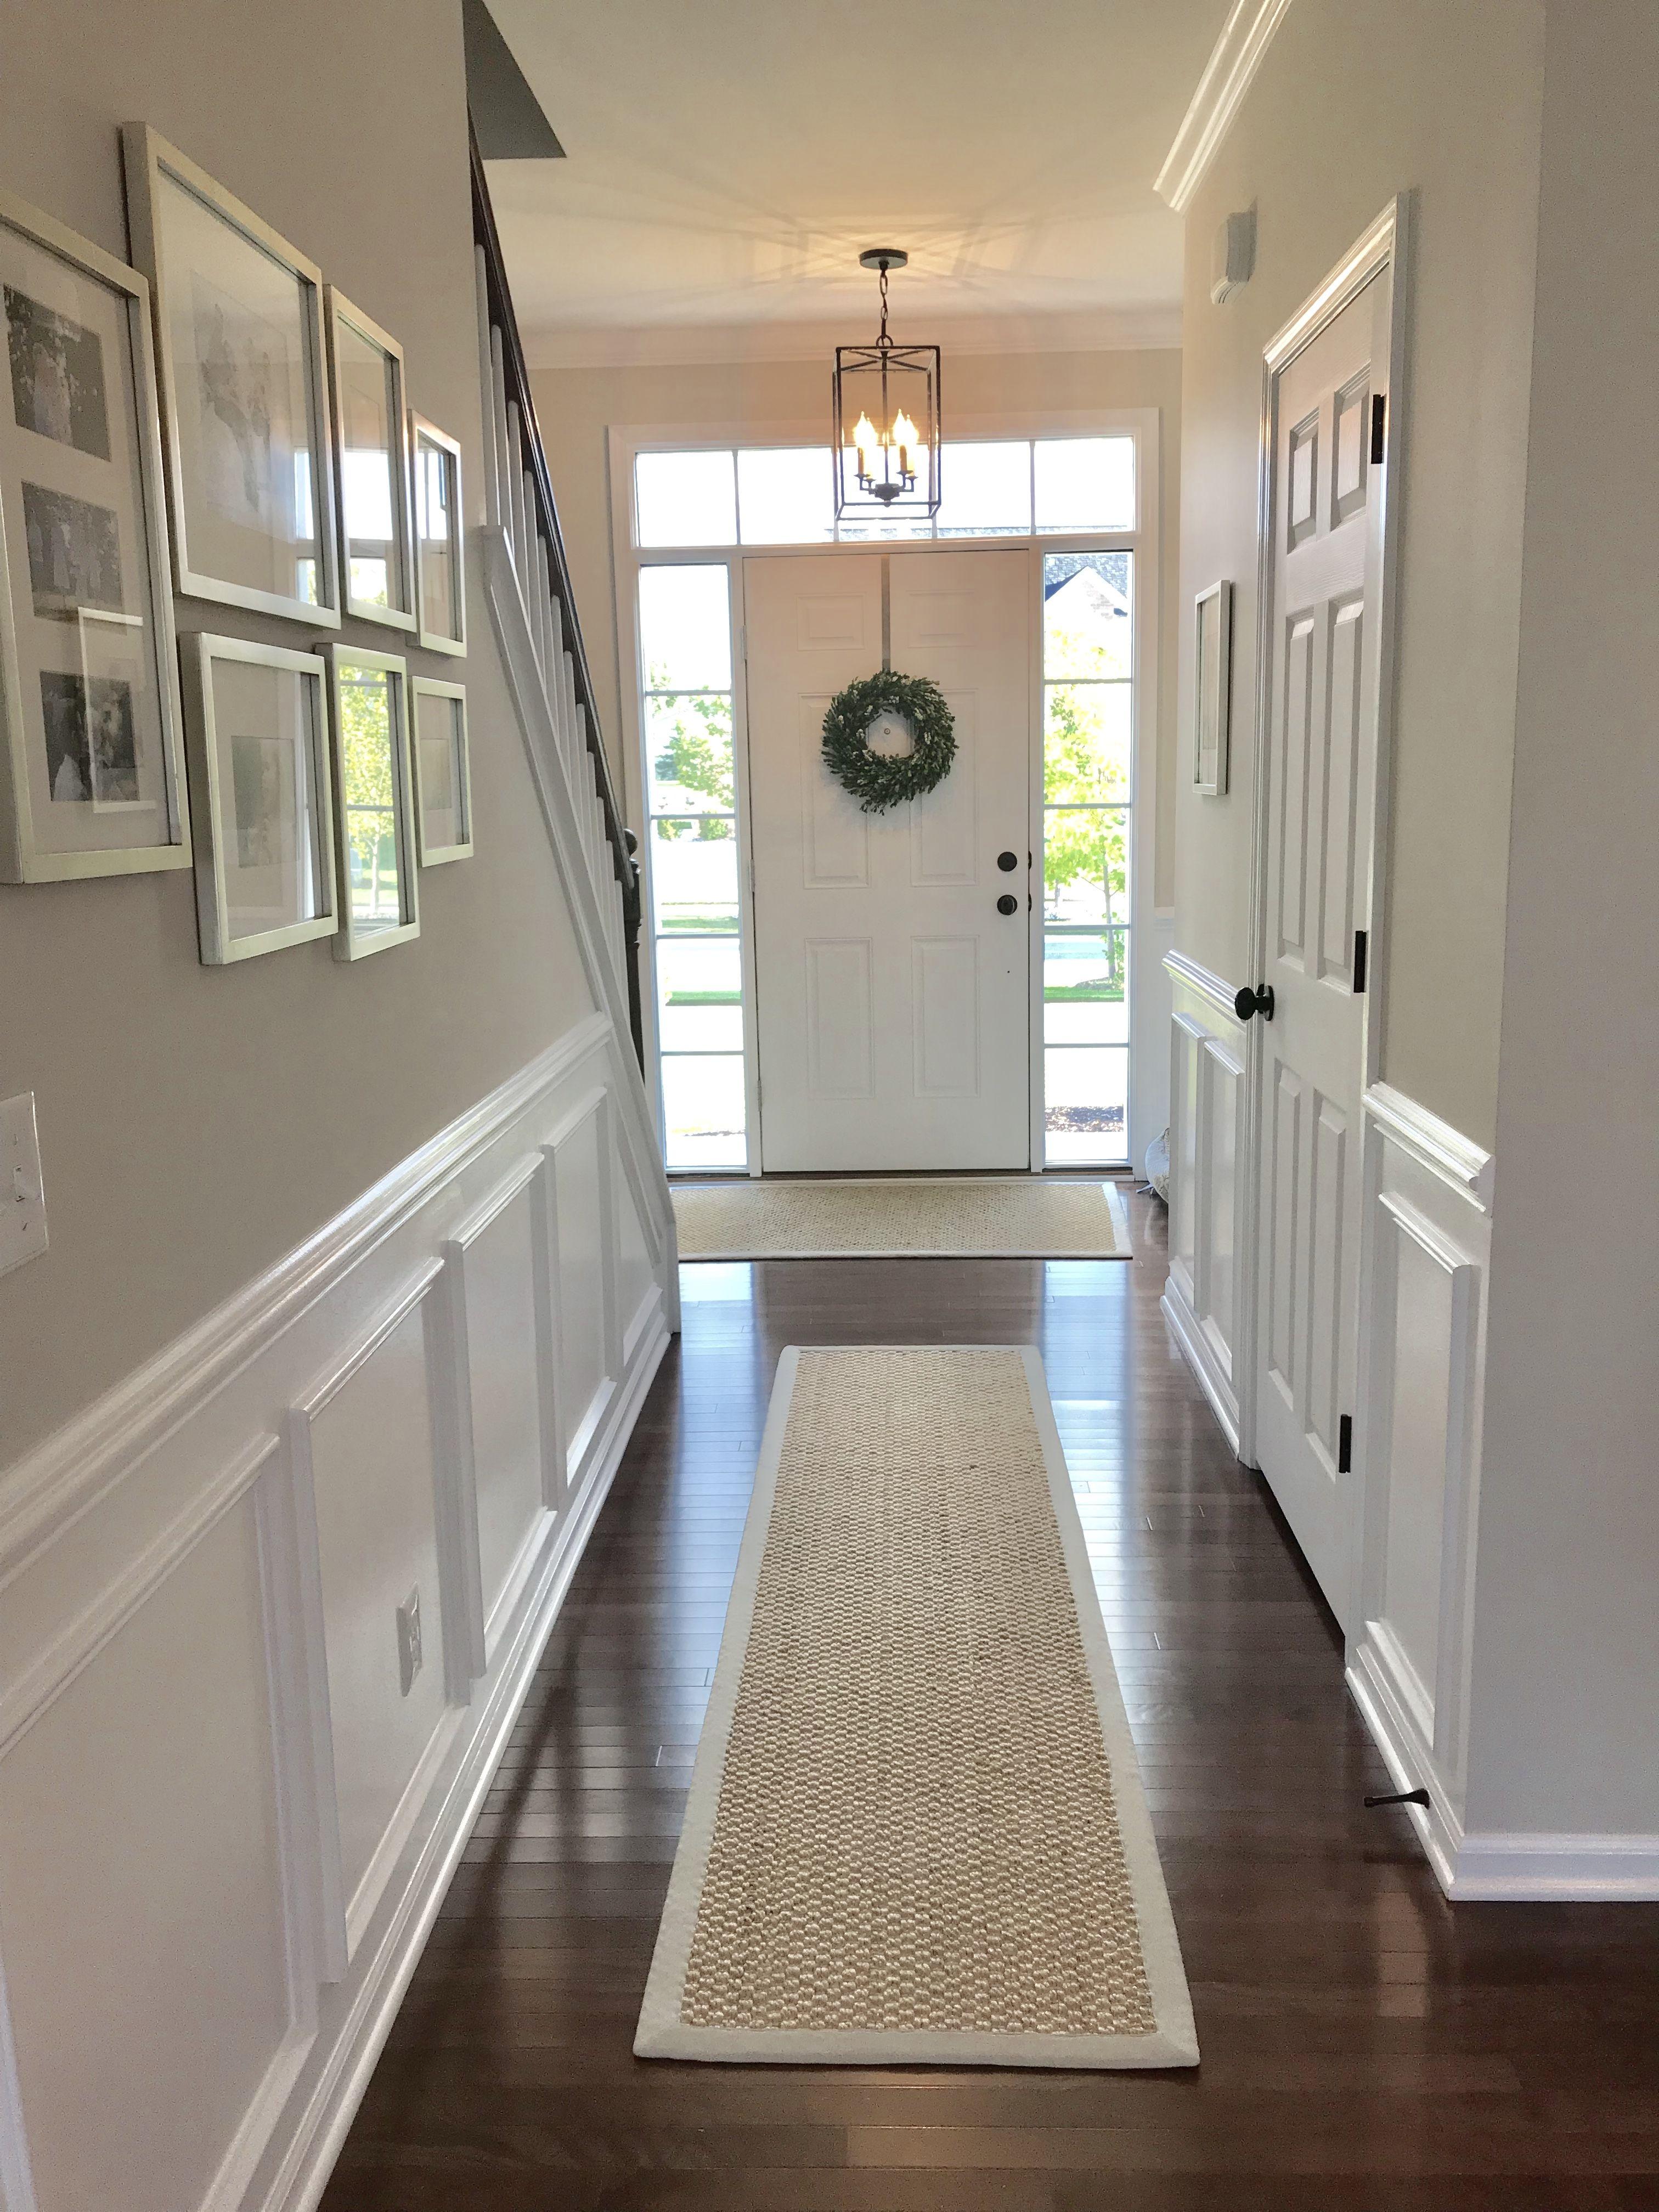 Hallway And Entryway Edgecomb Gray Benjamin Moore Edgecomb Gray